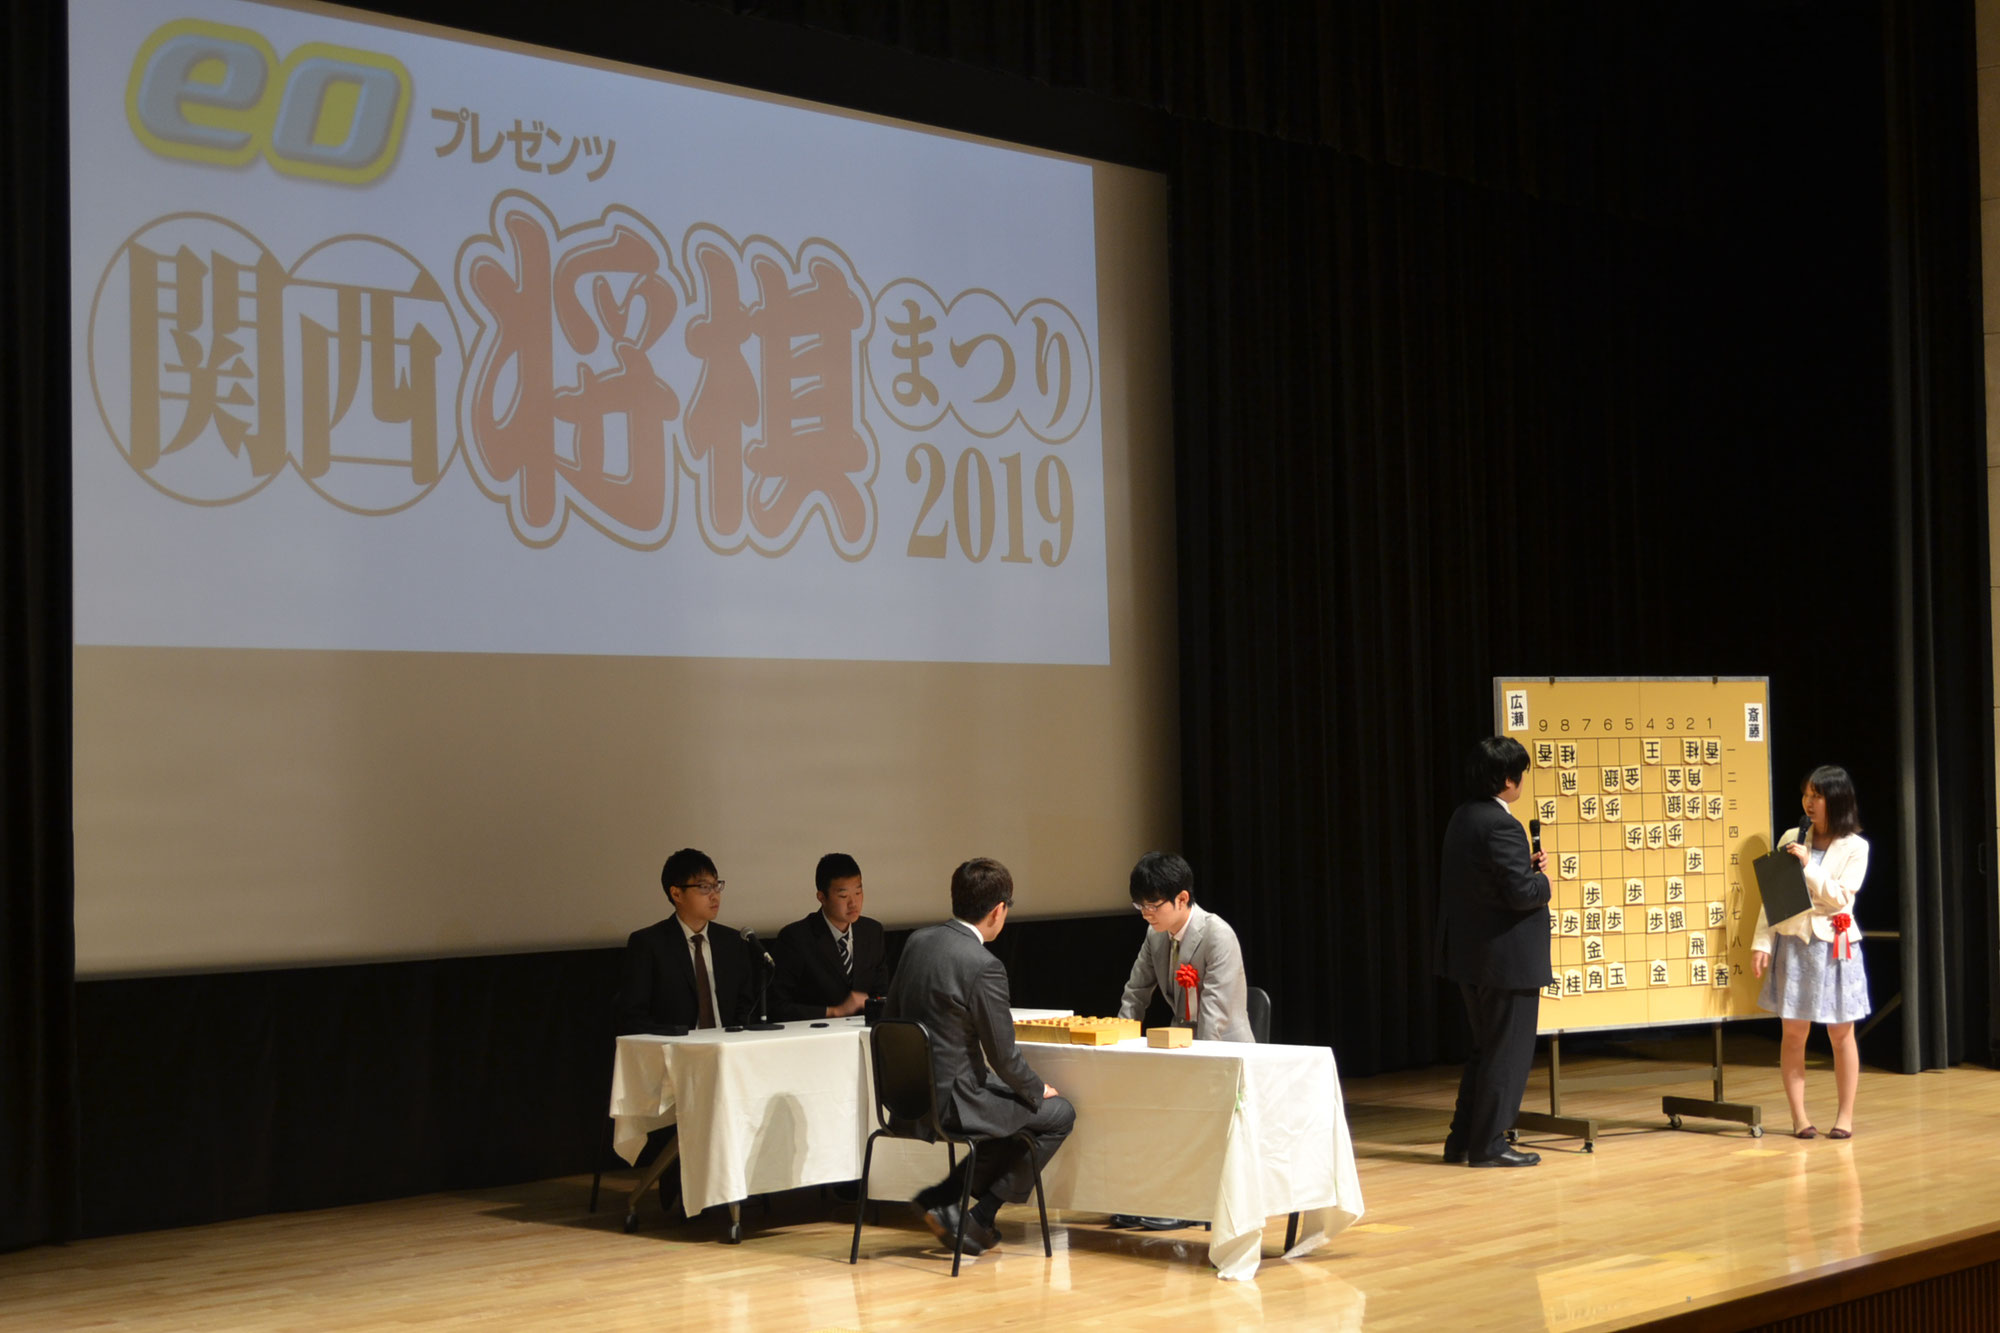 eo presents 関西将棋まつり(席上イベント)